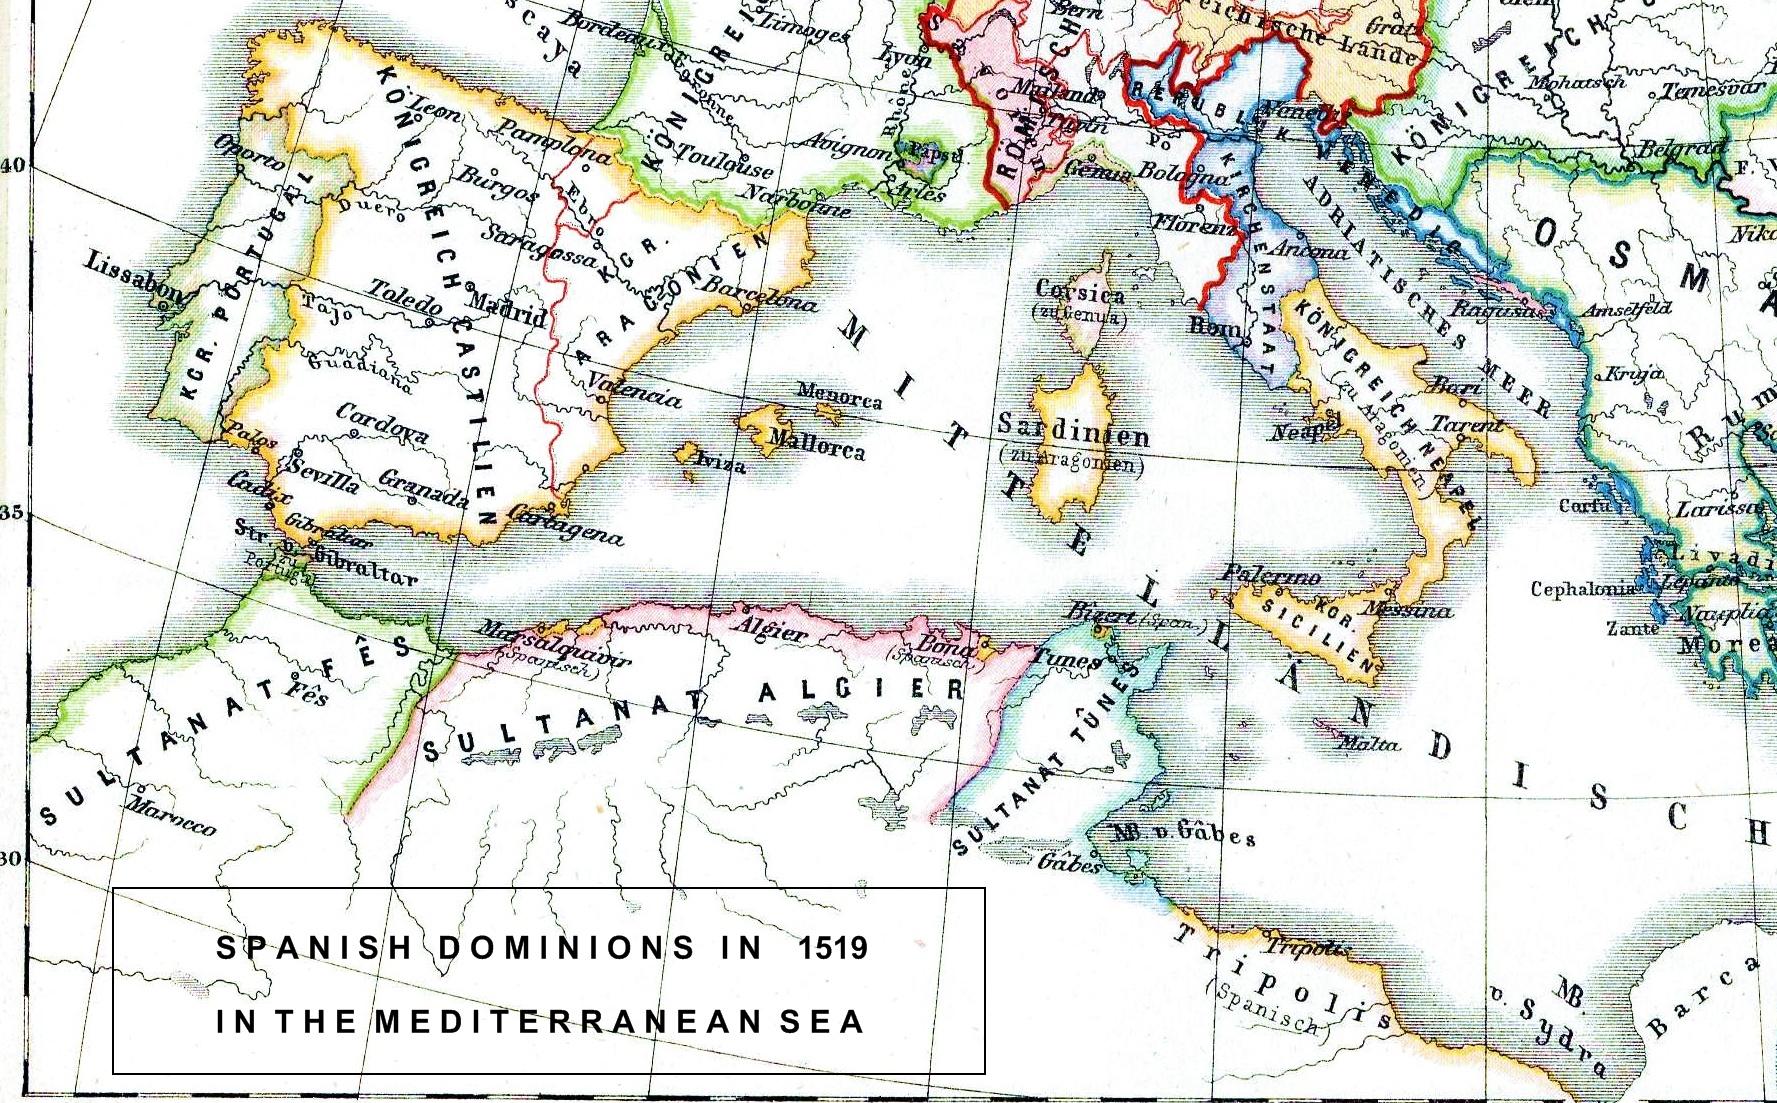 https://i0.wp.com/upload.wikimedia.org/wikipedia/commons/c/ca/Spanish_mediterranean_1519.jpg